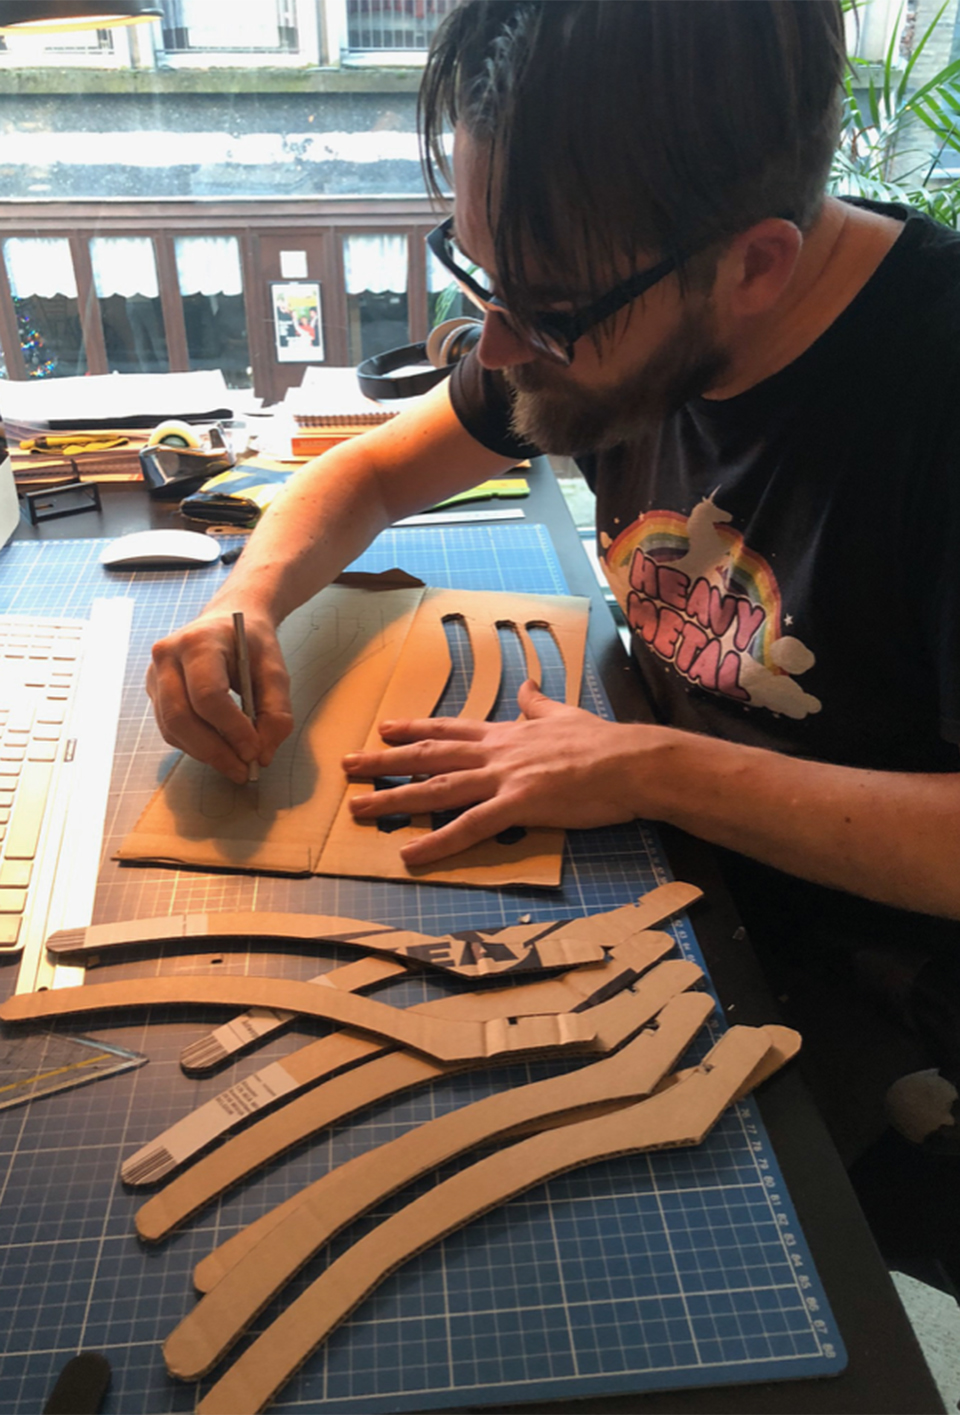 Stijn Wens cutting the cardboard